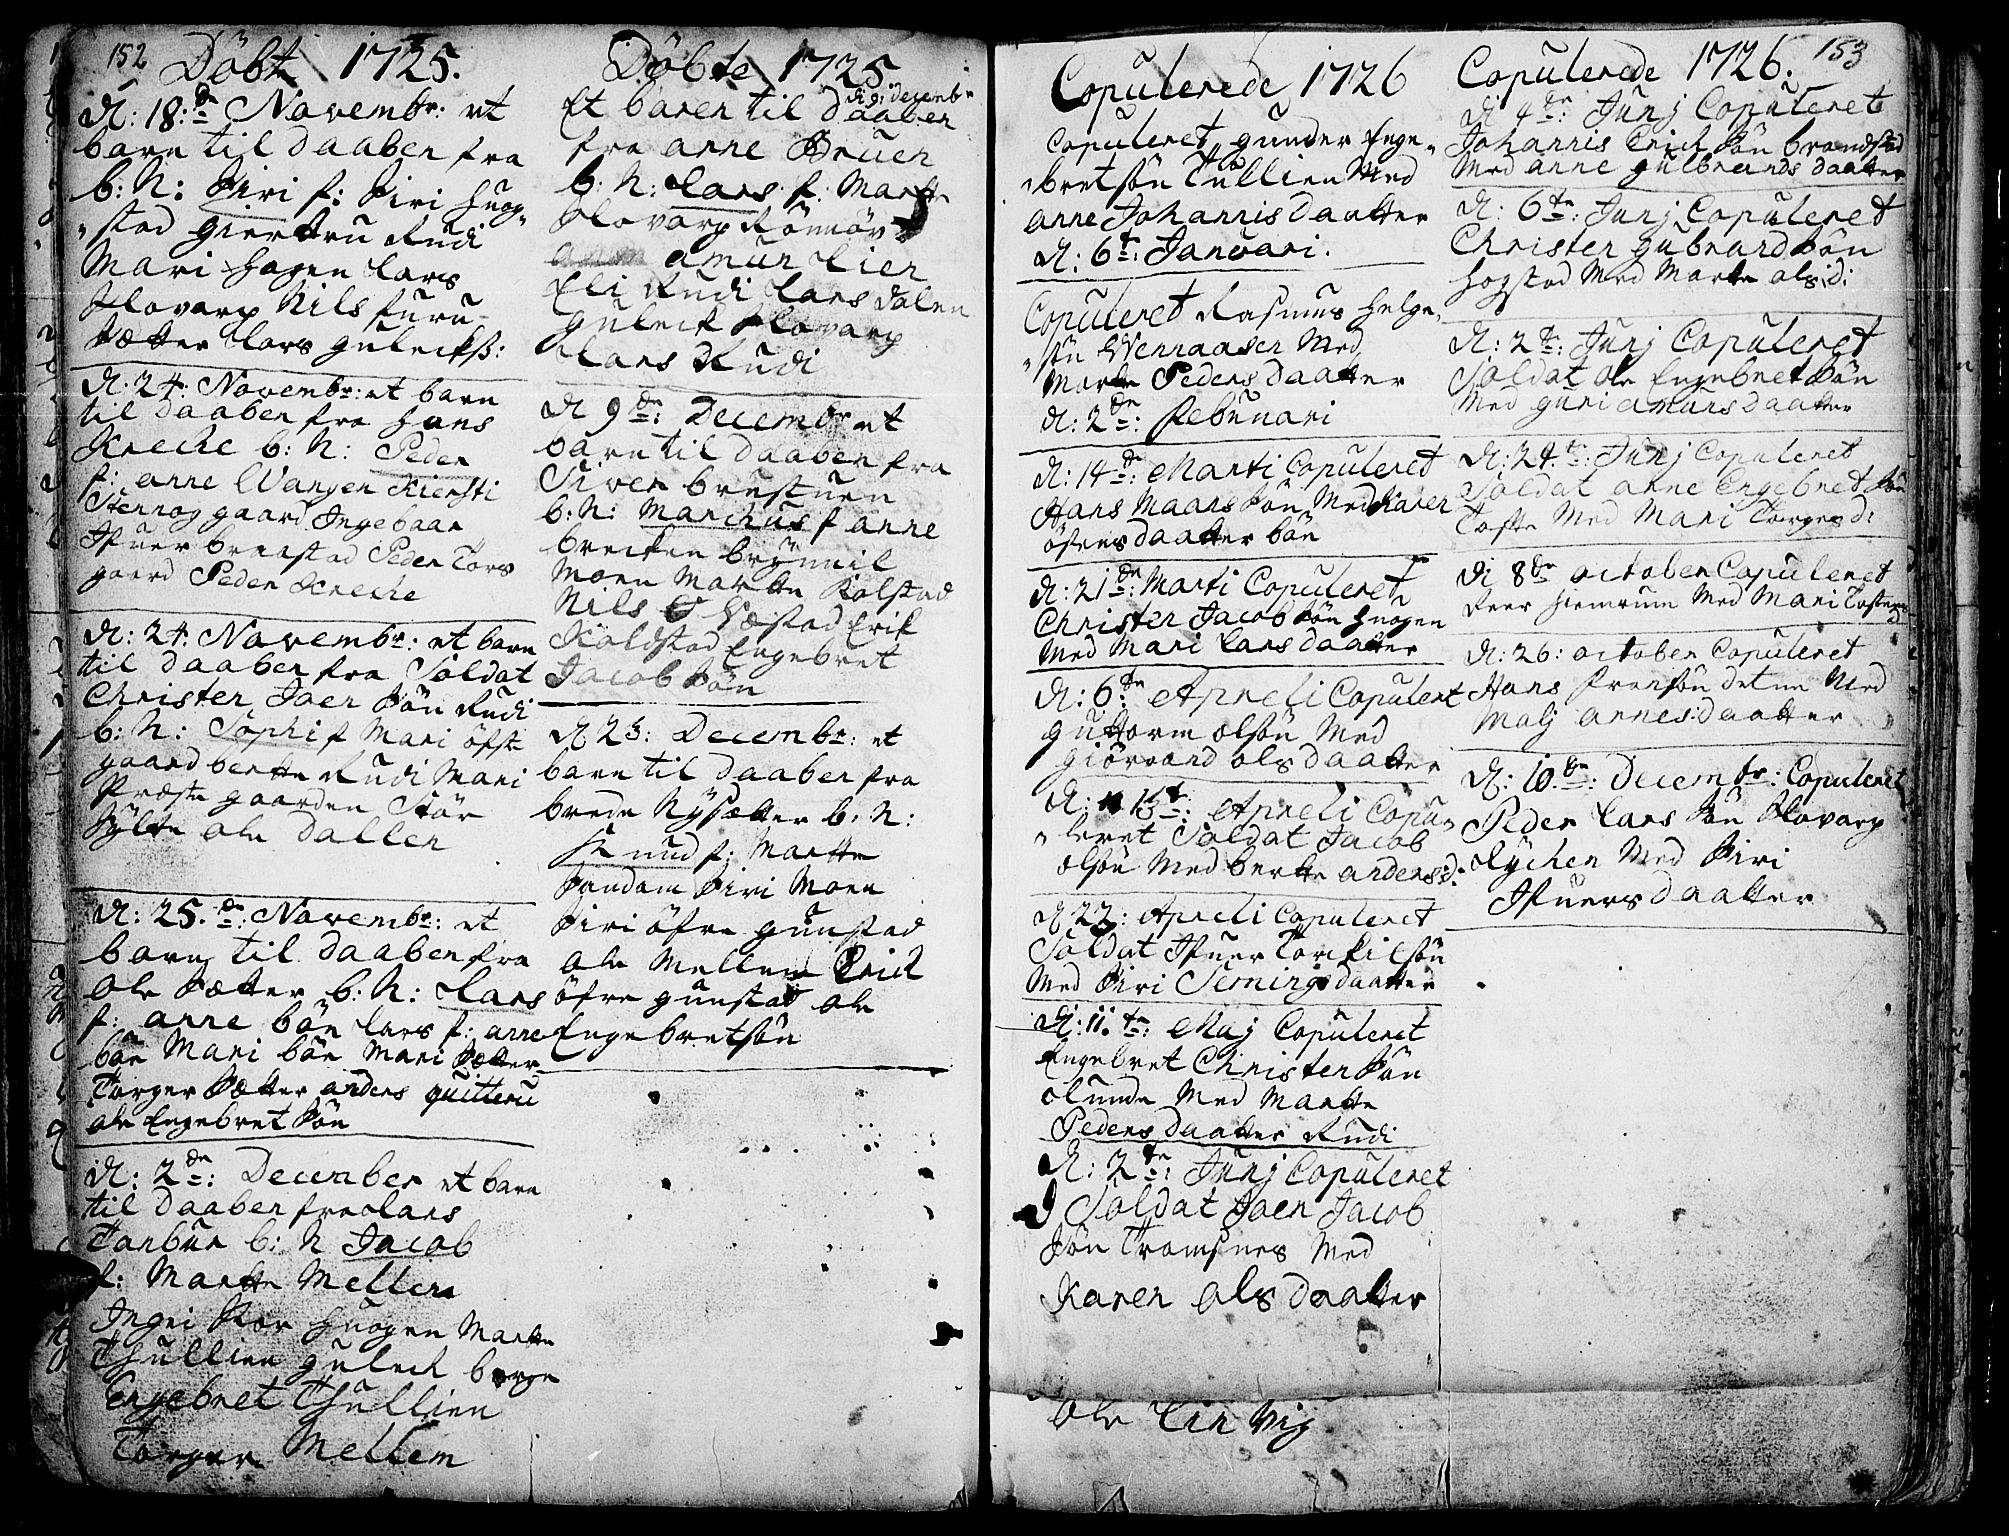 SAH, Ringebu prestekontor, Ministerialbok nr. 1, 1696-1733, s. 152-153